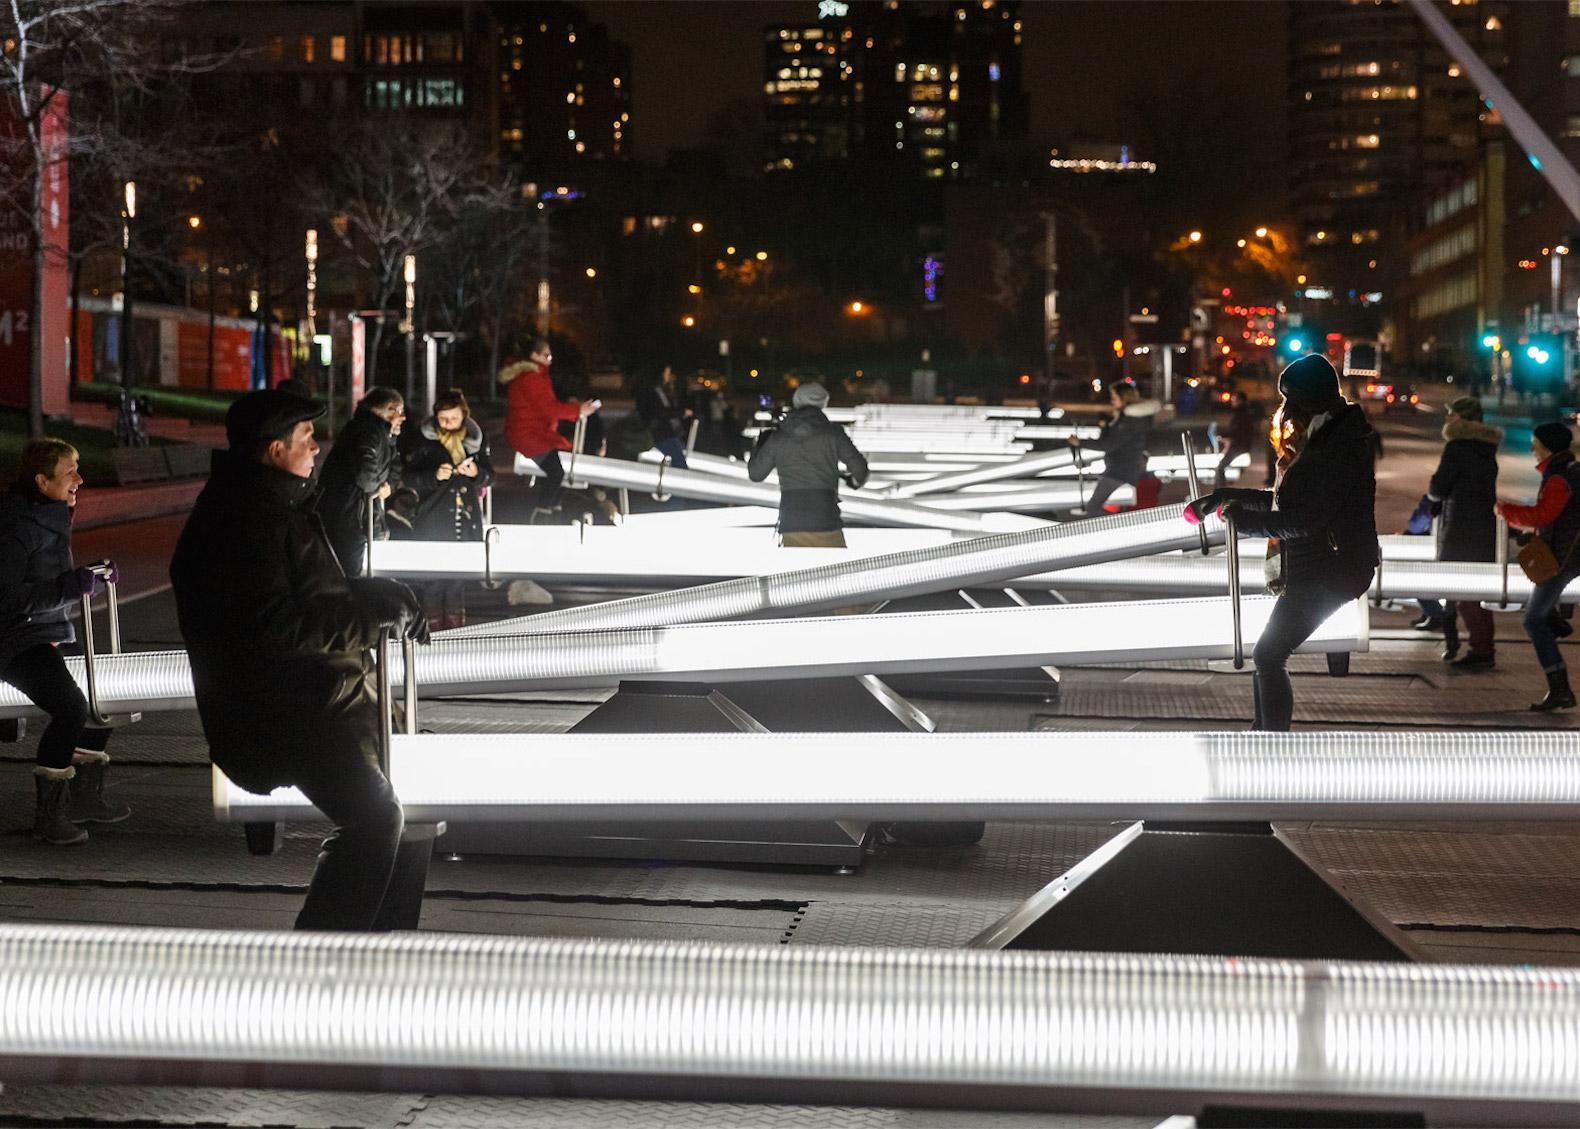 Montreal: 30 altalene luminose suonate dai passanti